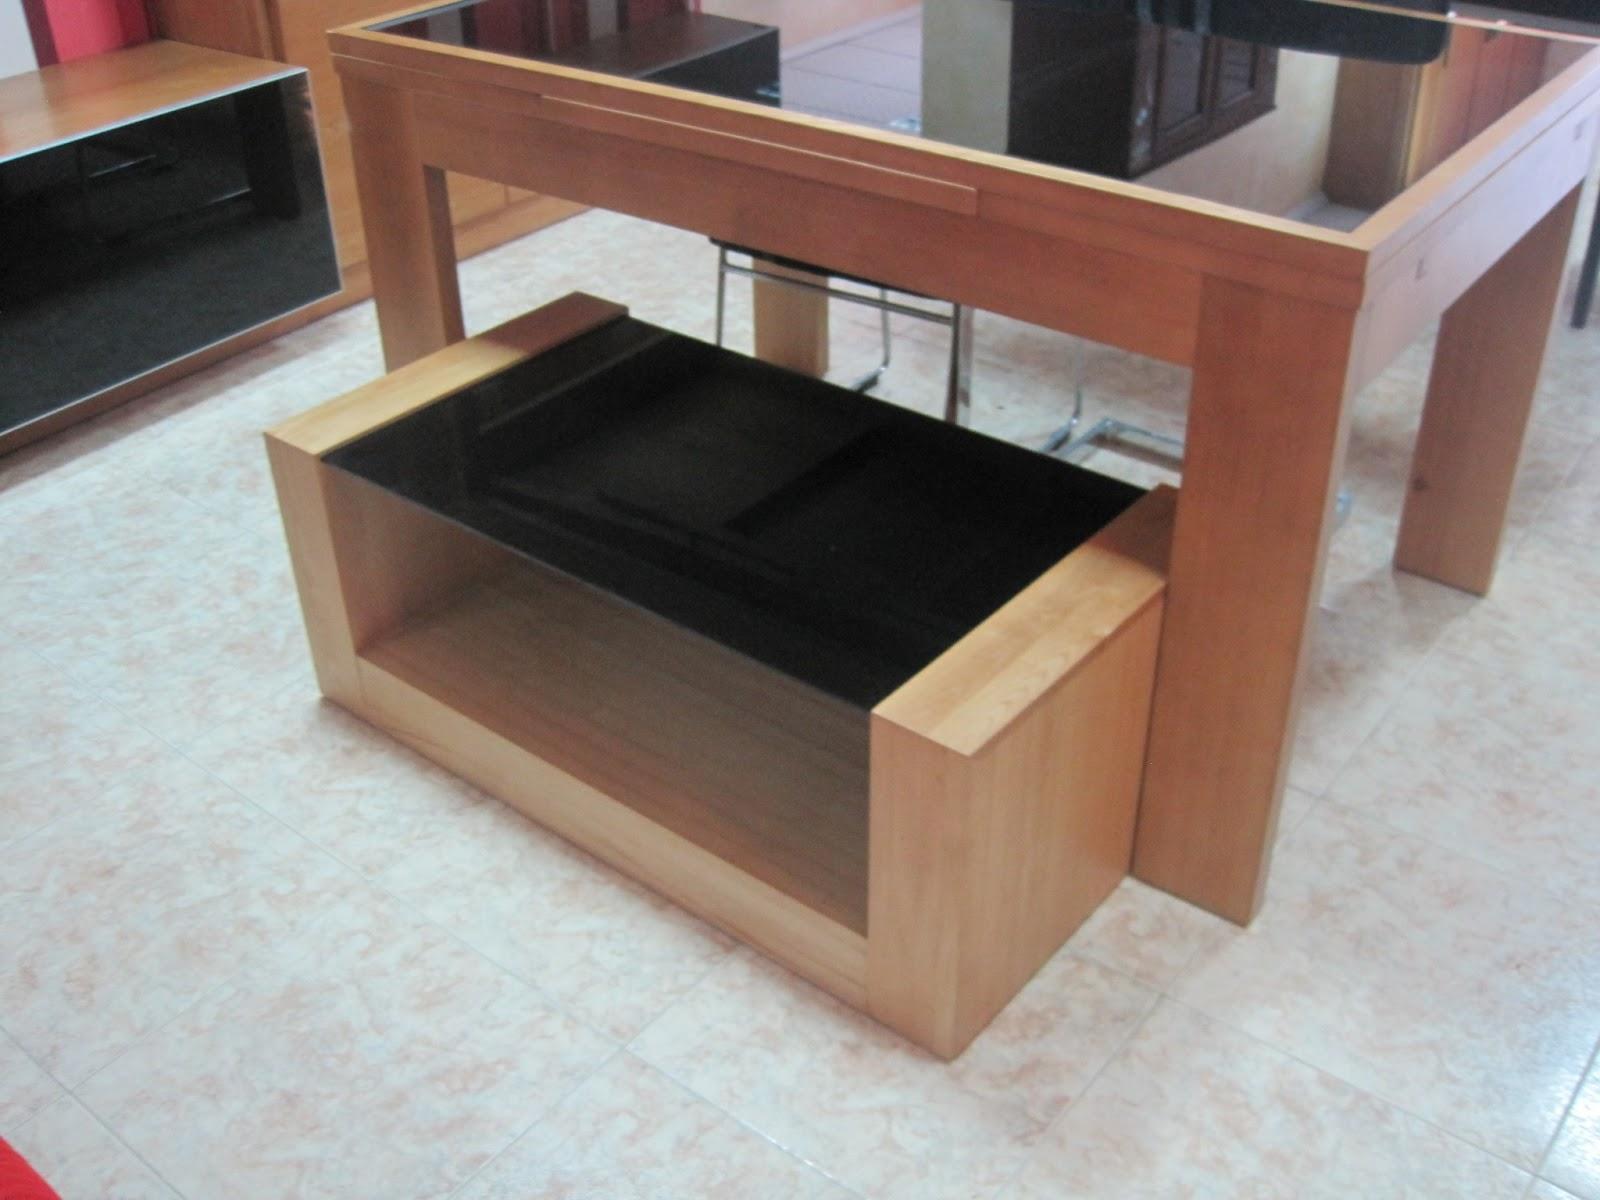 Fotos de muebles de comedor de madera for Comedores en oferta